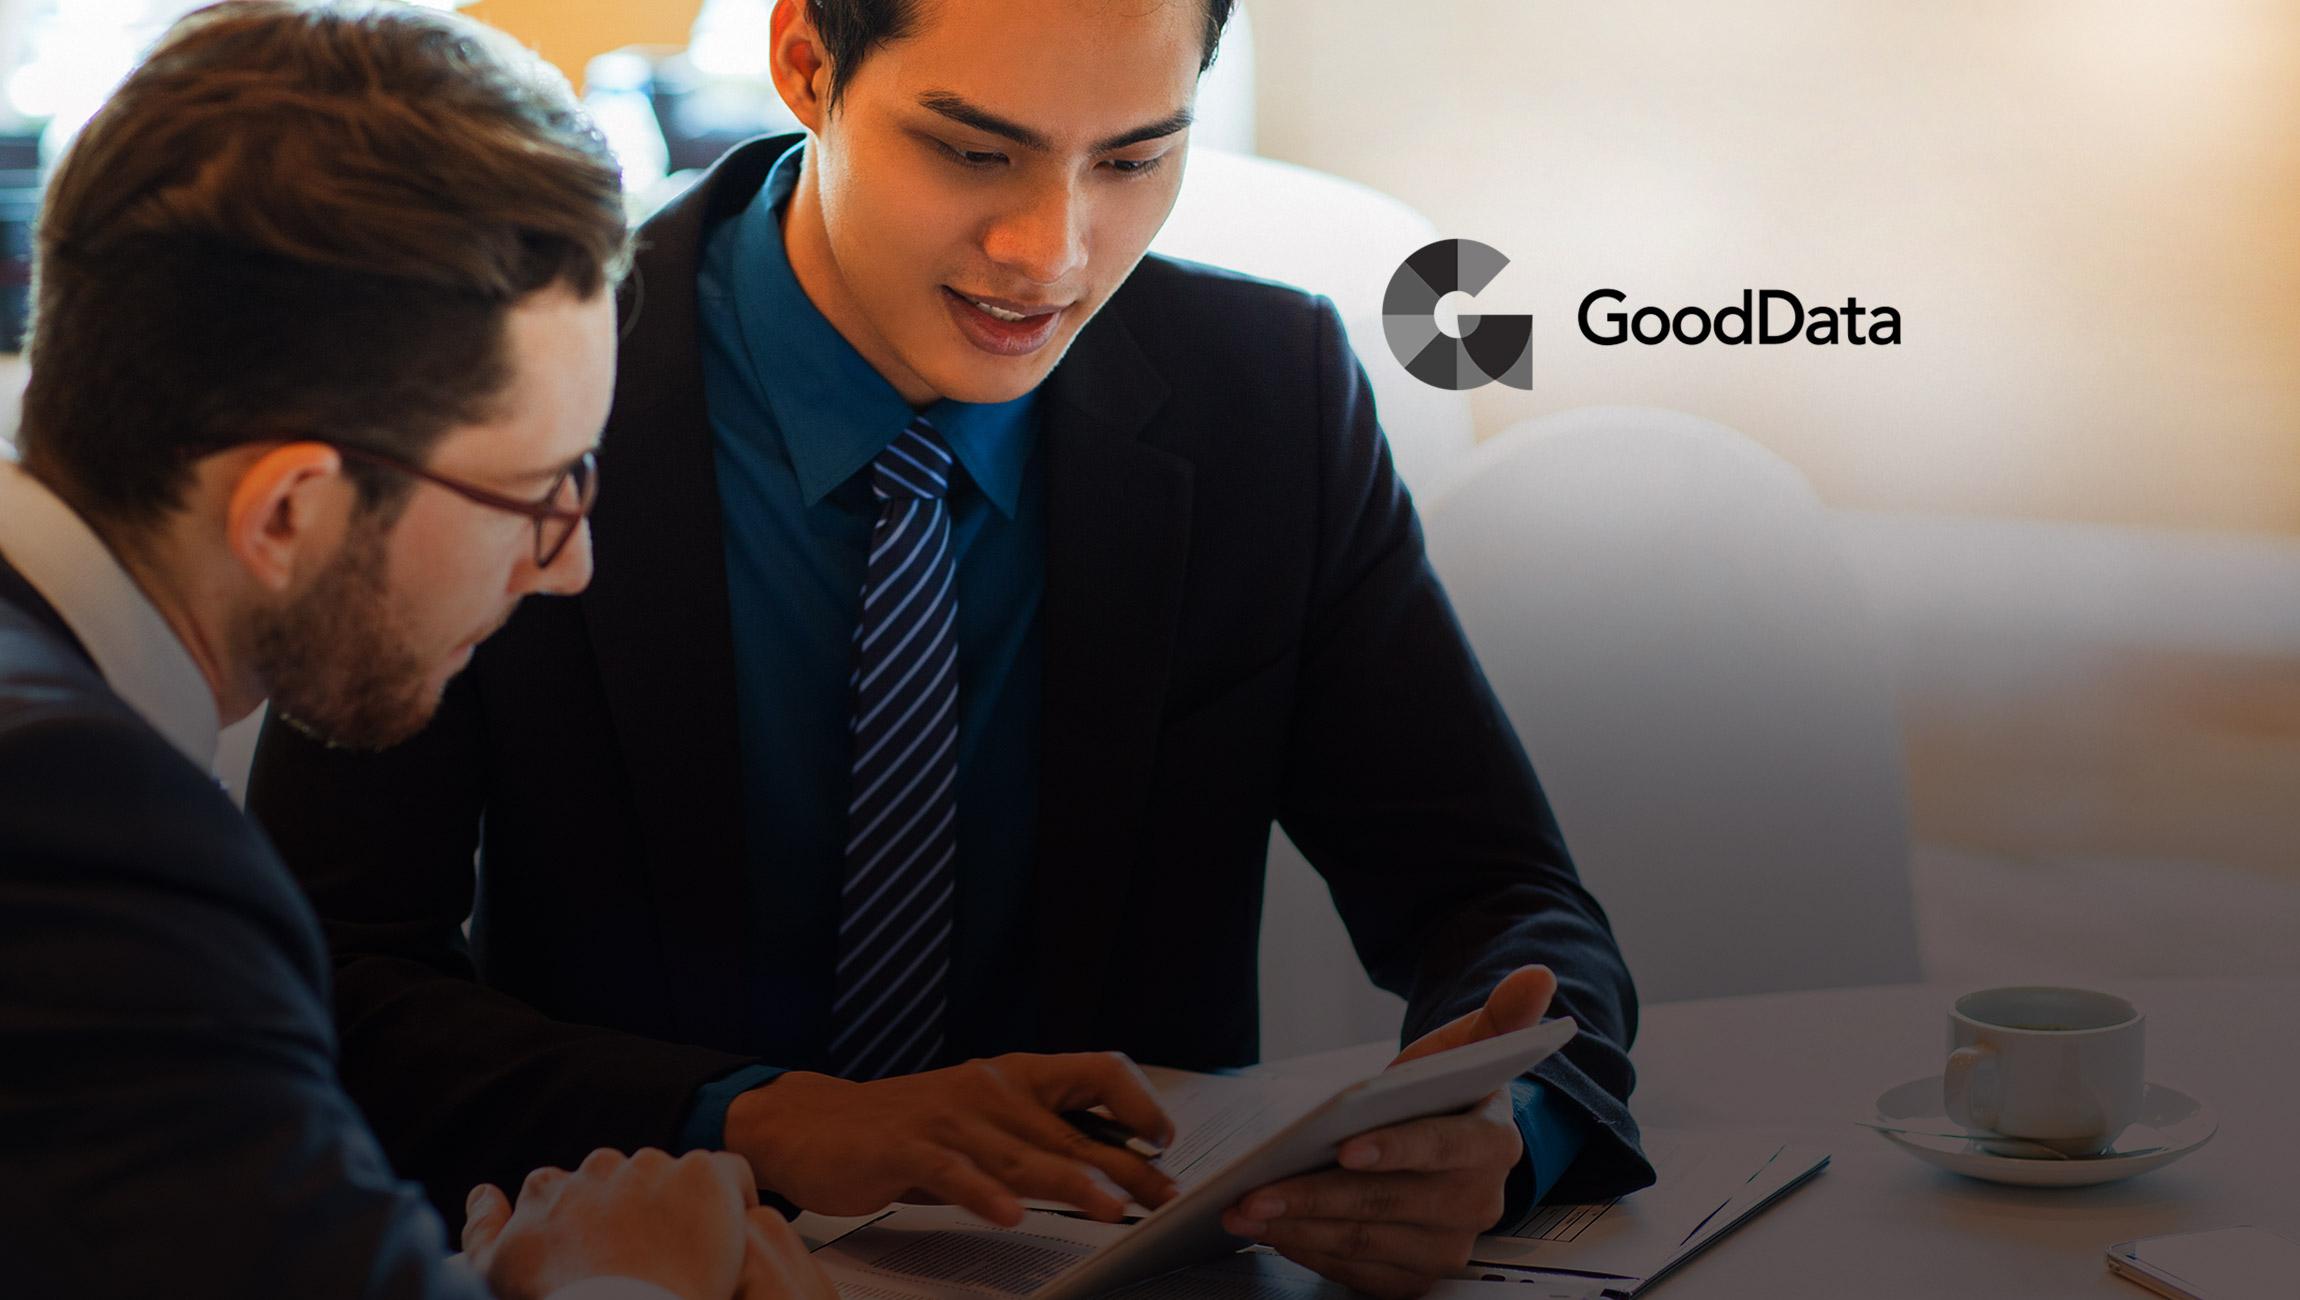 GoodData Open Sources Next-Generation GoodData.UI Framework to Increase Business Intelligence Adoption